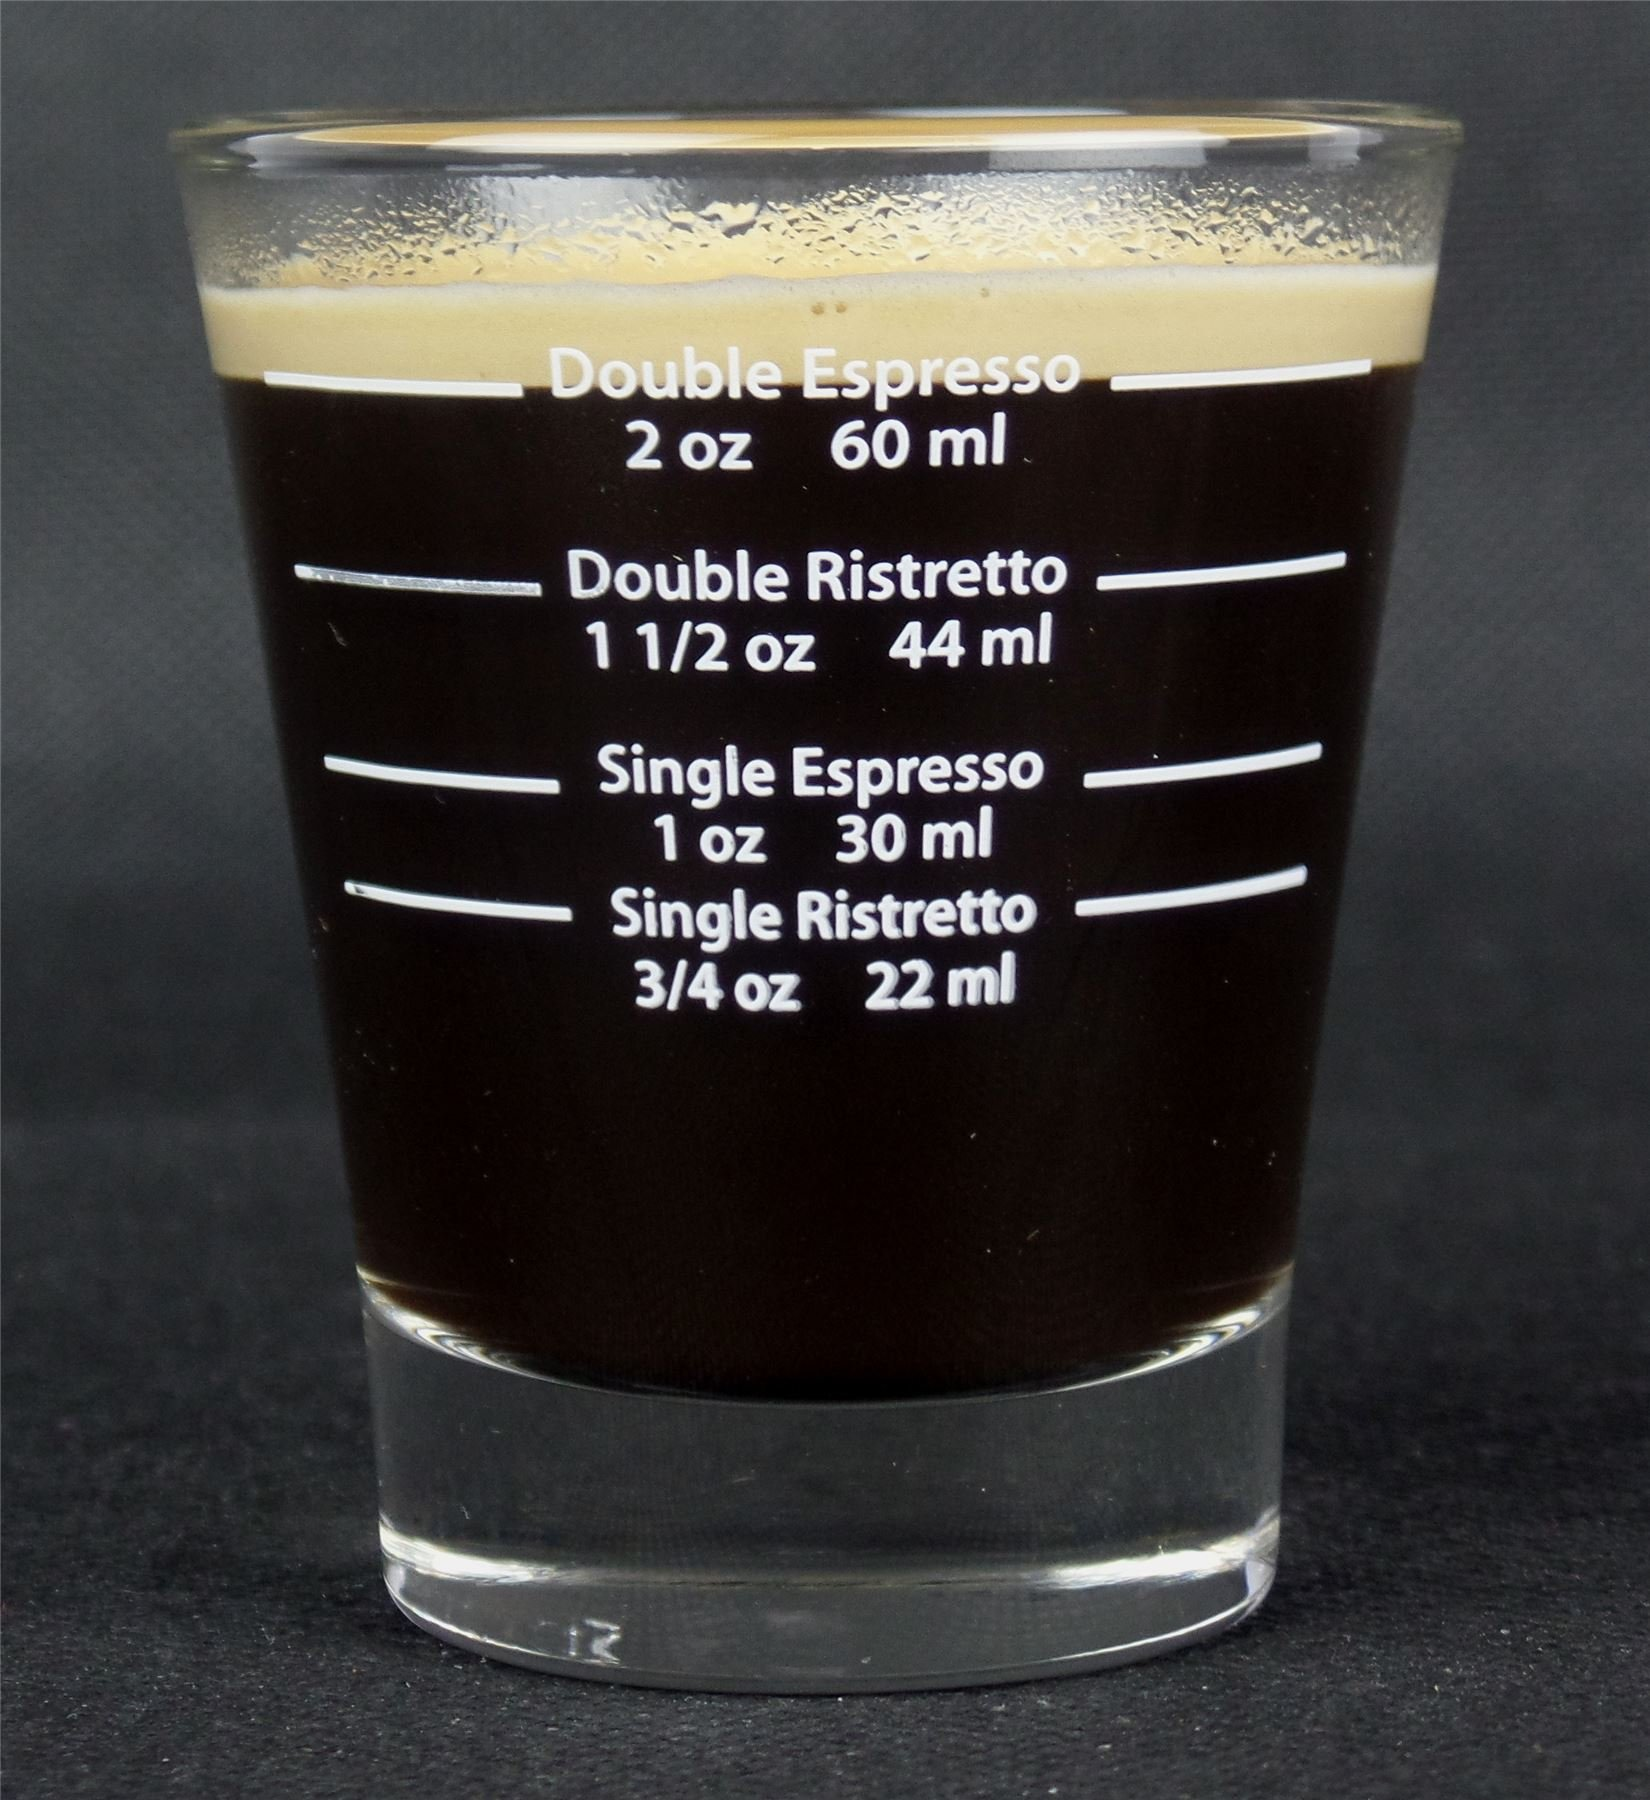 81RtHqoDUYL - White Lined Espresso Shot Glass Measure for Coffee Espresso Machines - 85ml - by EDESIA ESPRESS